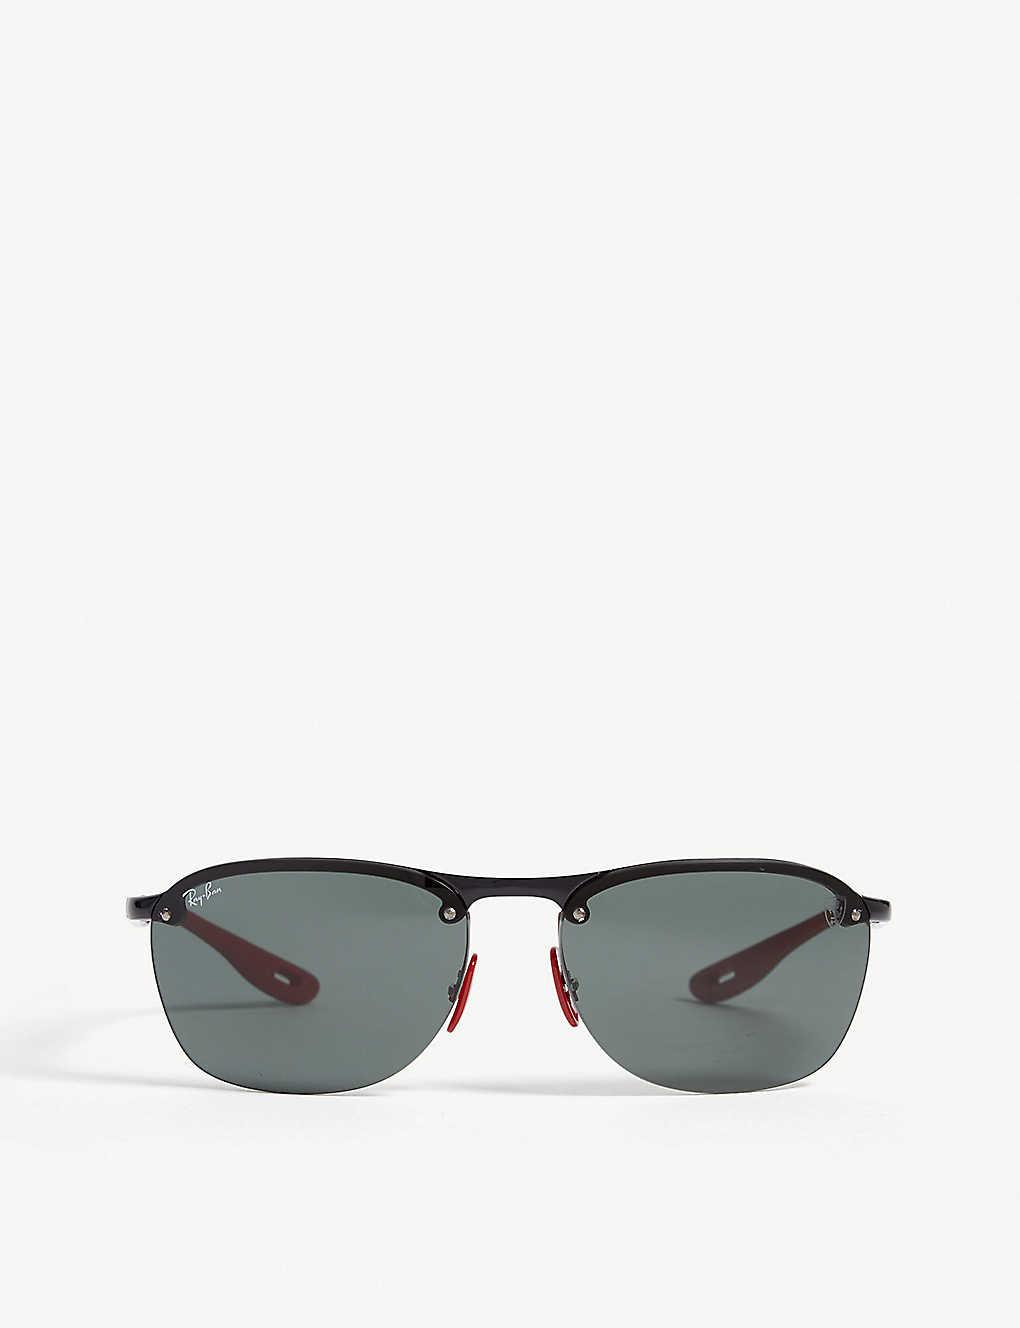 59d06aaba8 RB4302 Ferrari rectangle-frame sunglasses - Black ...